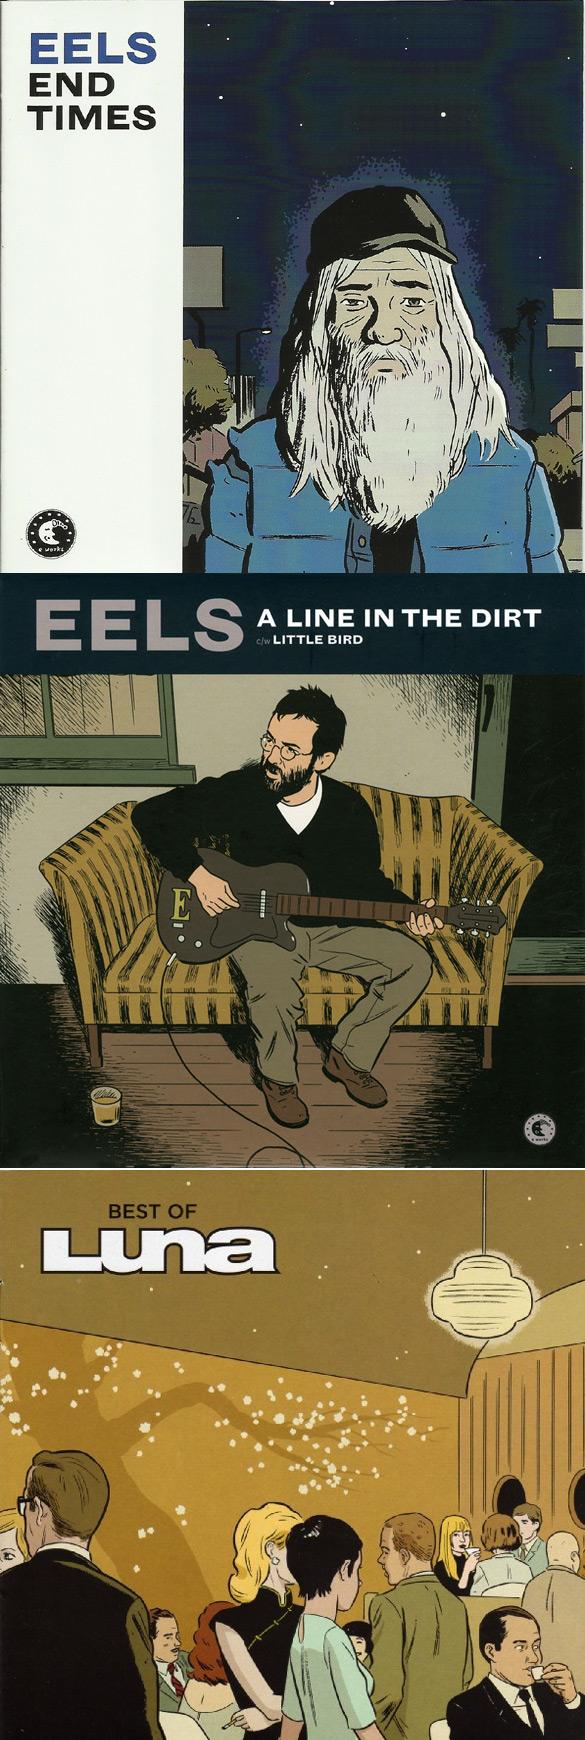 "Okładki Adriane'a Tomine'a do płyt Eels ""End Times"" i ""A line in the dirt / Little bird"" oraz Luna ""The best of...""."